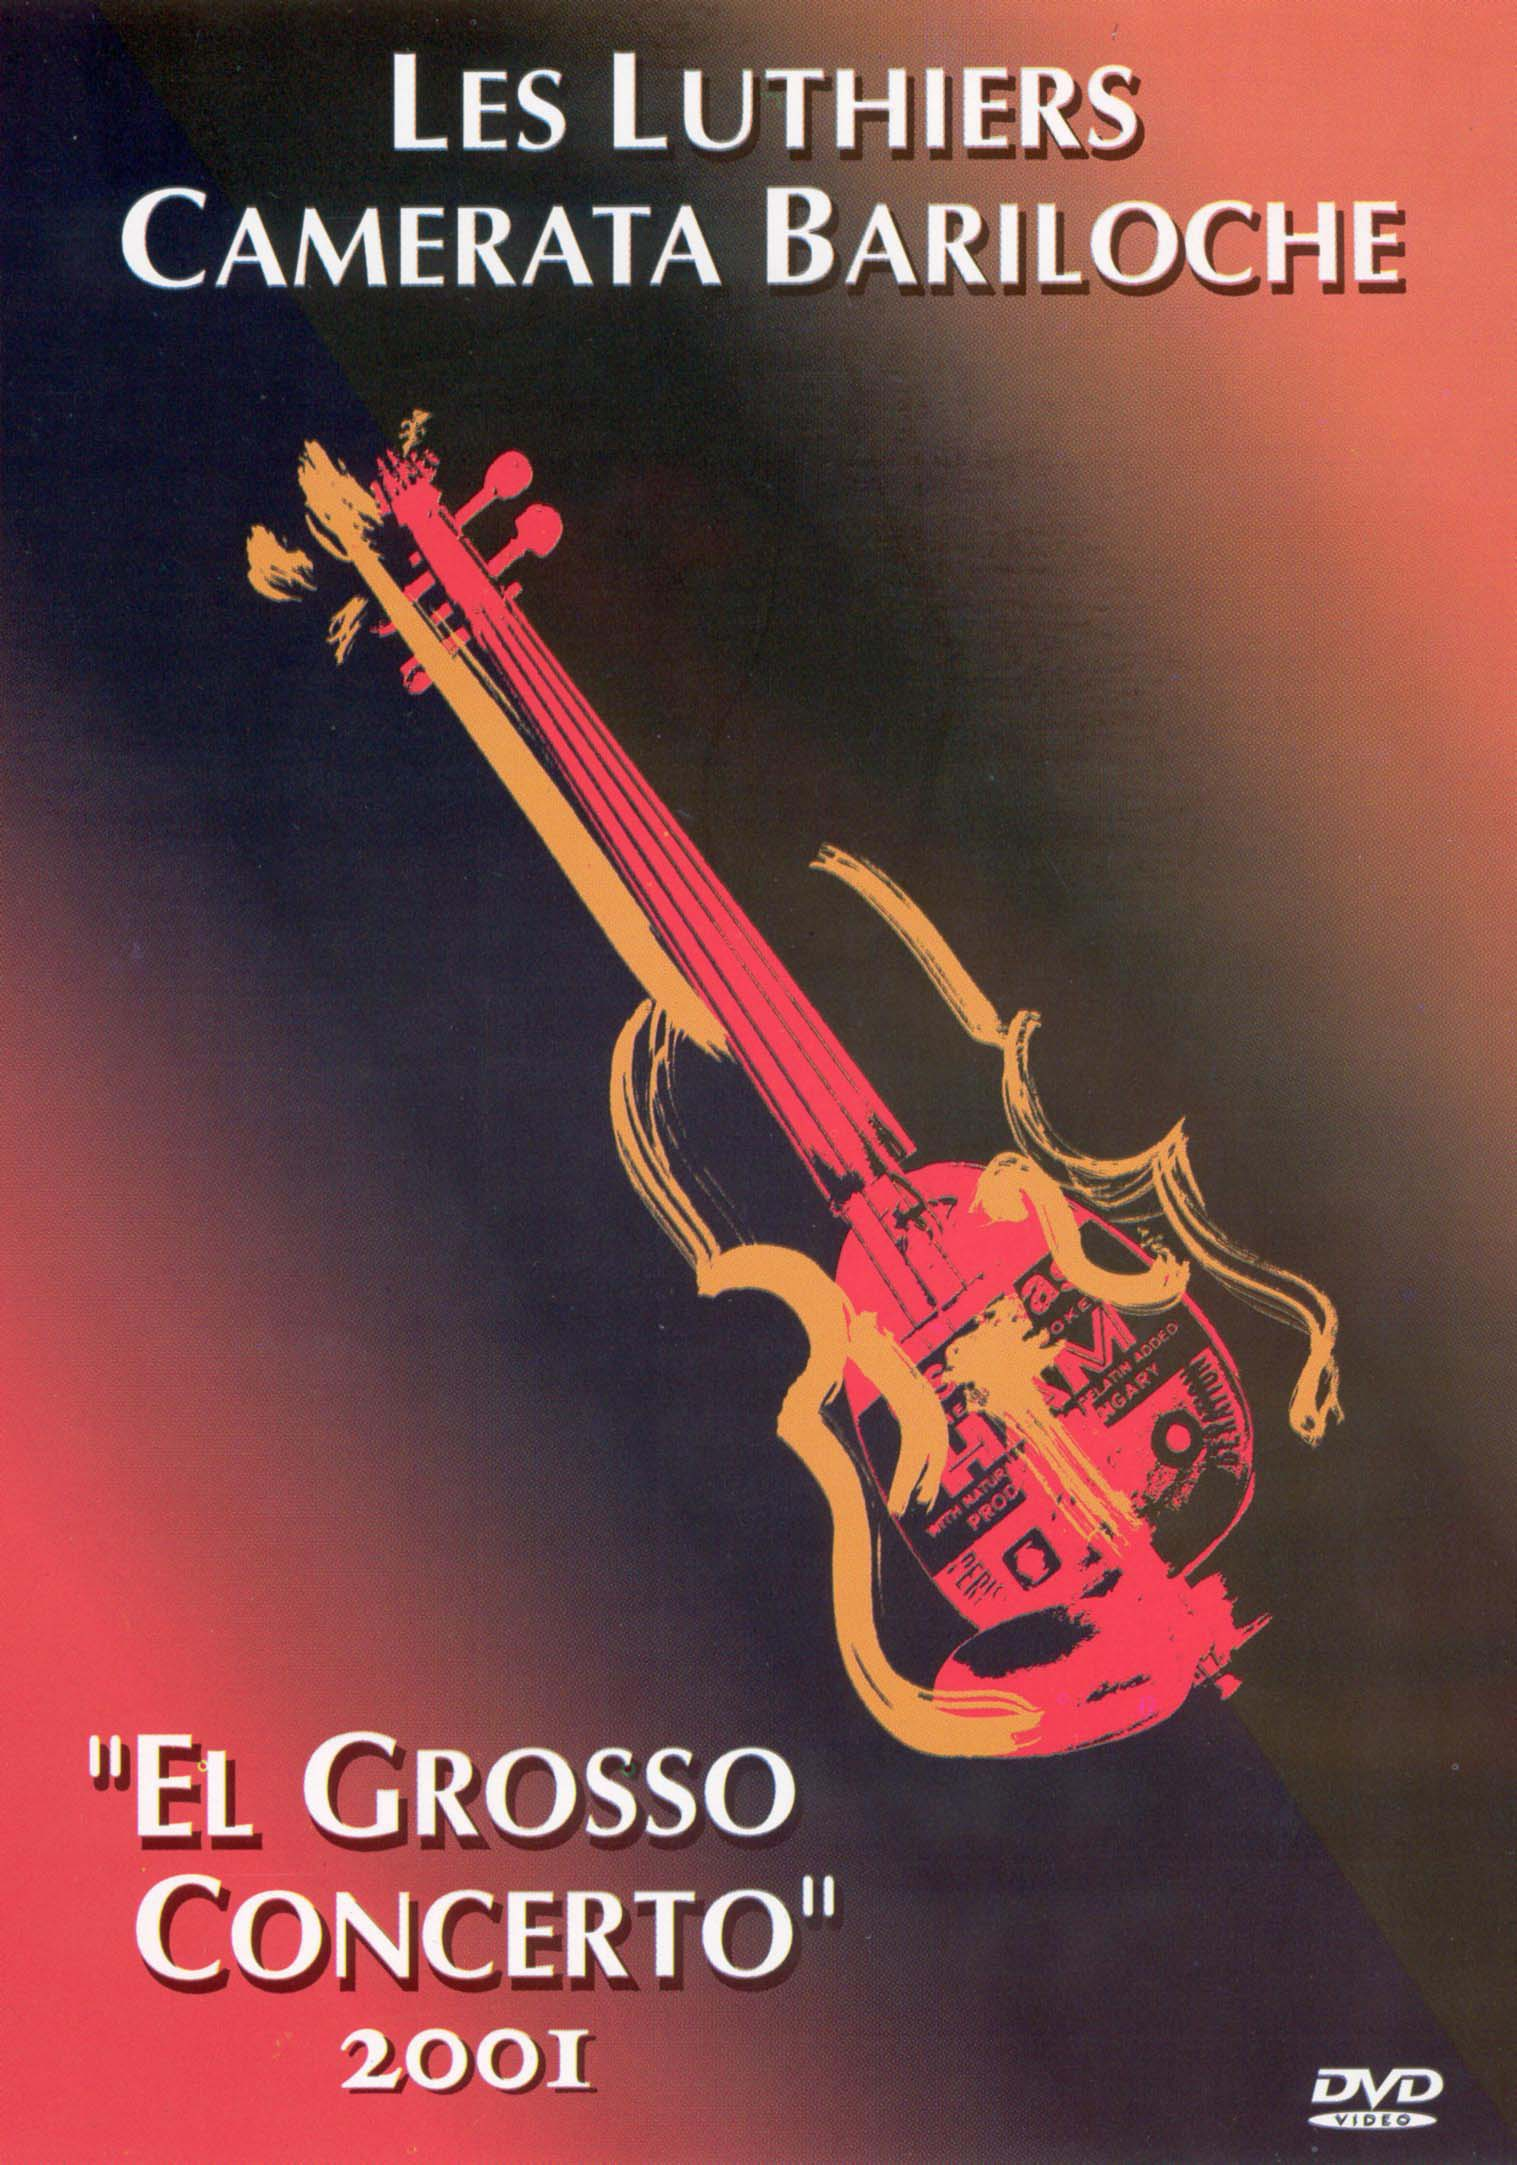 Les Luthiers: Camerata Bariloche - El Grosso Concerto